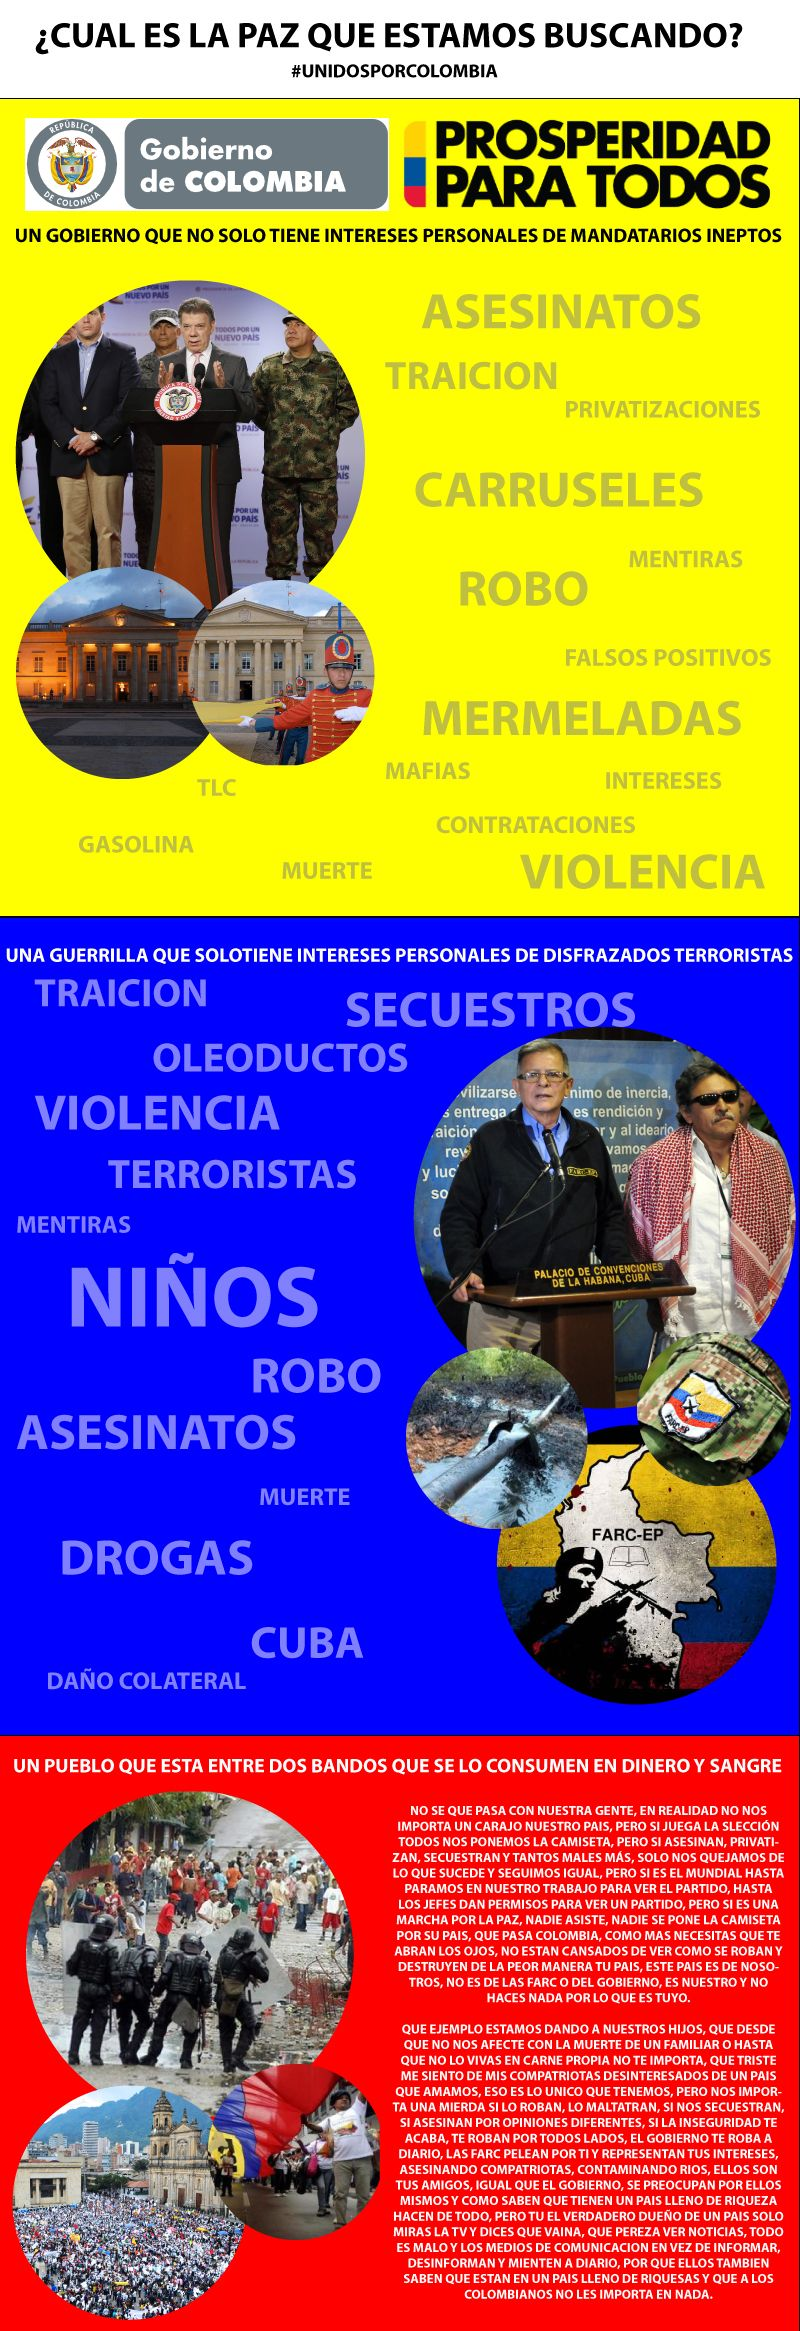 #UNIDOSPORCOLOMBIA